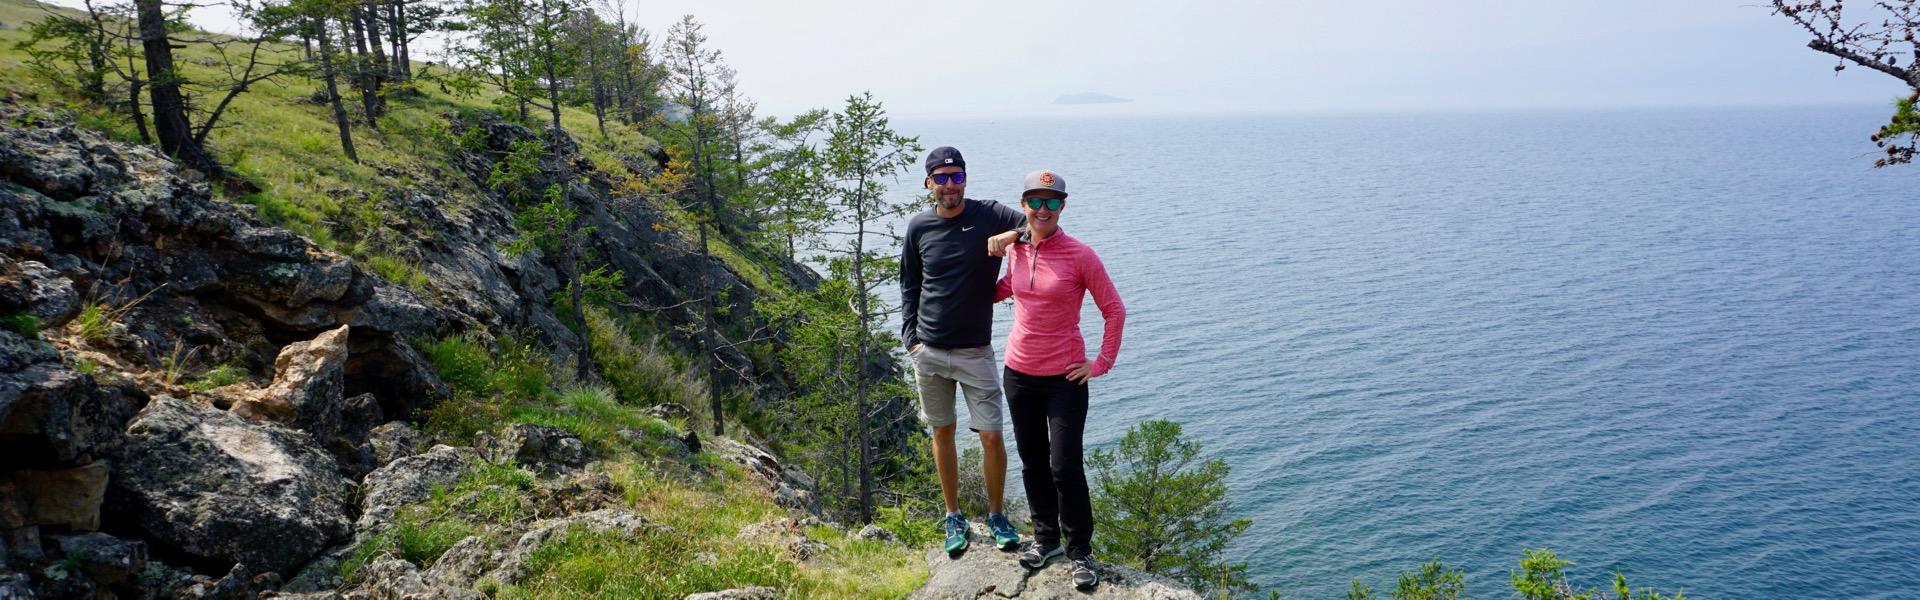 Reiseblog Expedition Lieblingsorte